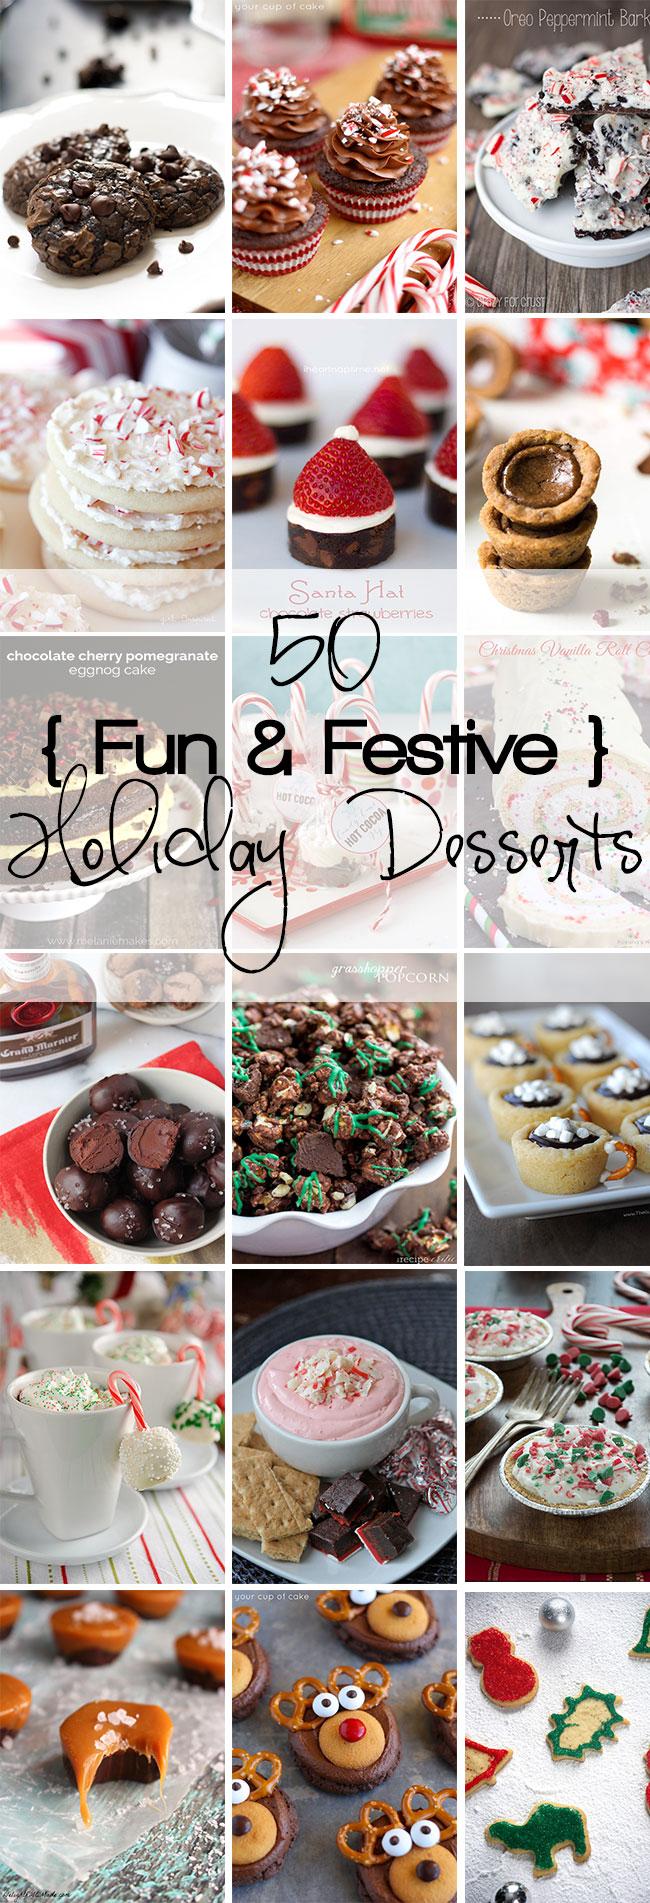 50 Fun & Festive Holiday Desserts!